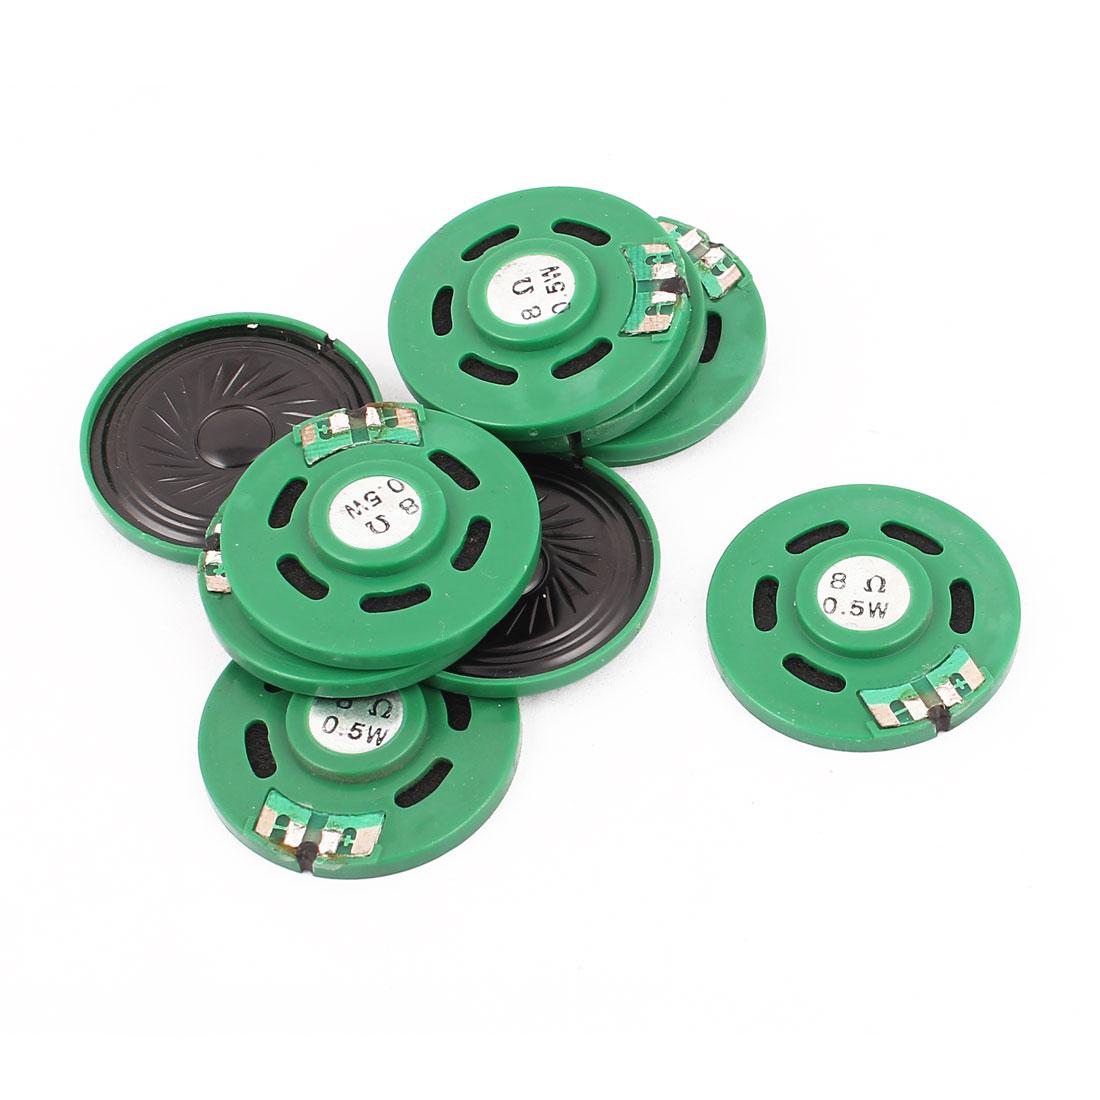 0.5W 40mm Diameter 8 Ohm Internal Mini Magnet Speaker Loudspeaker 10Pcs